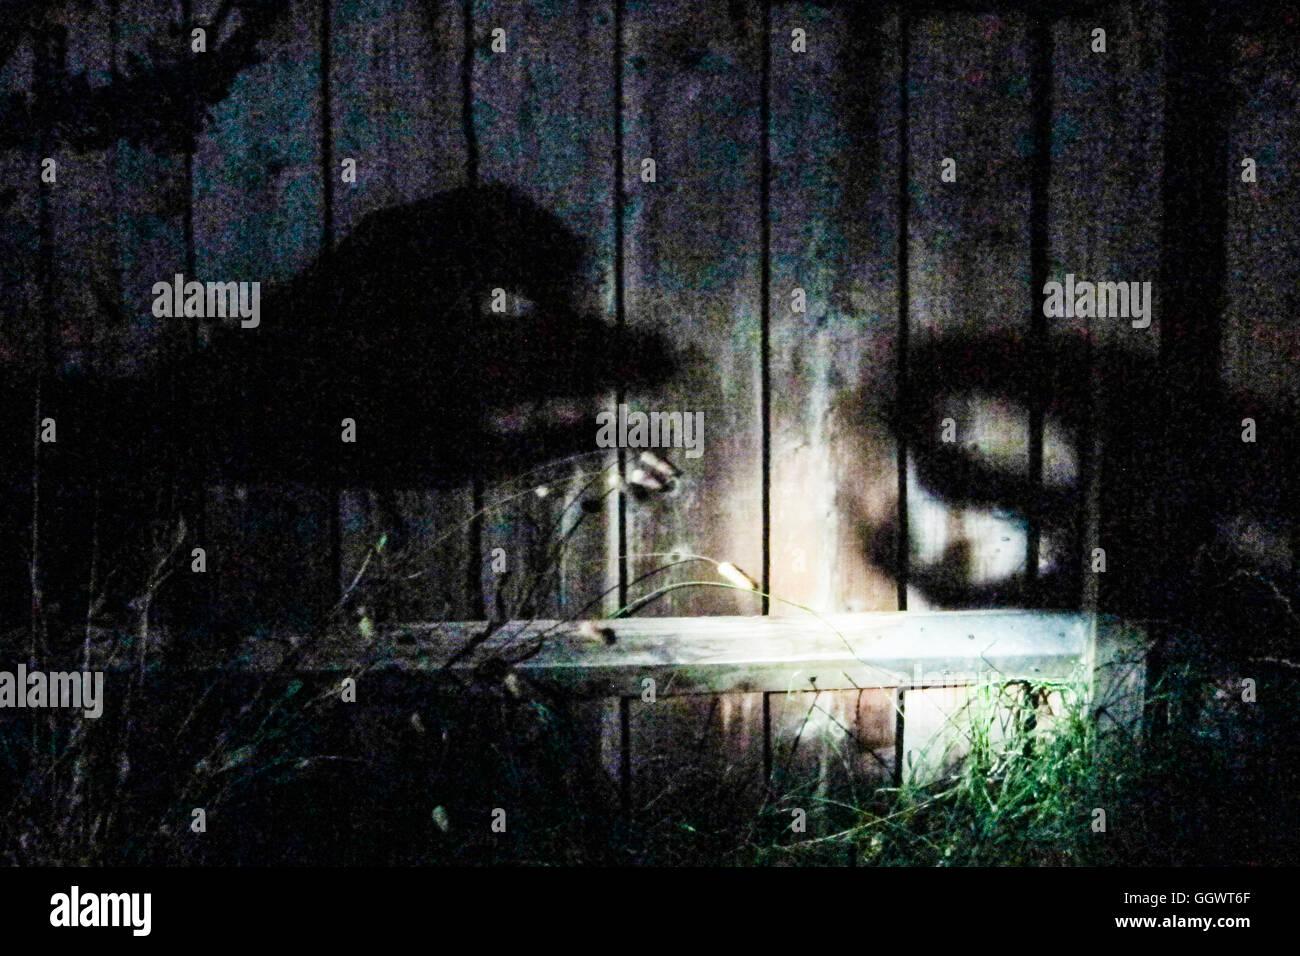 Hand shadows make shadow monsters on garden fence - Berkhamsted, UK - Stock Image